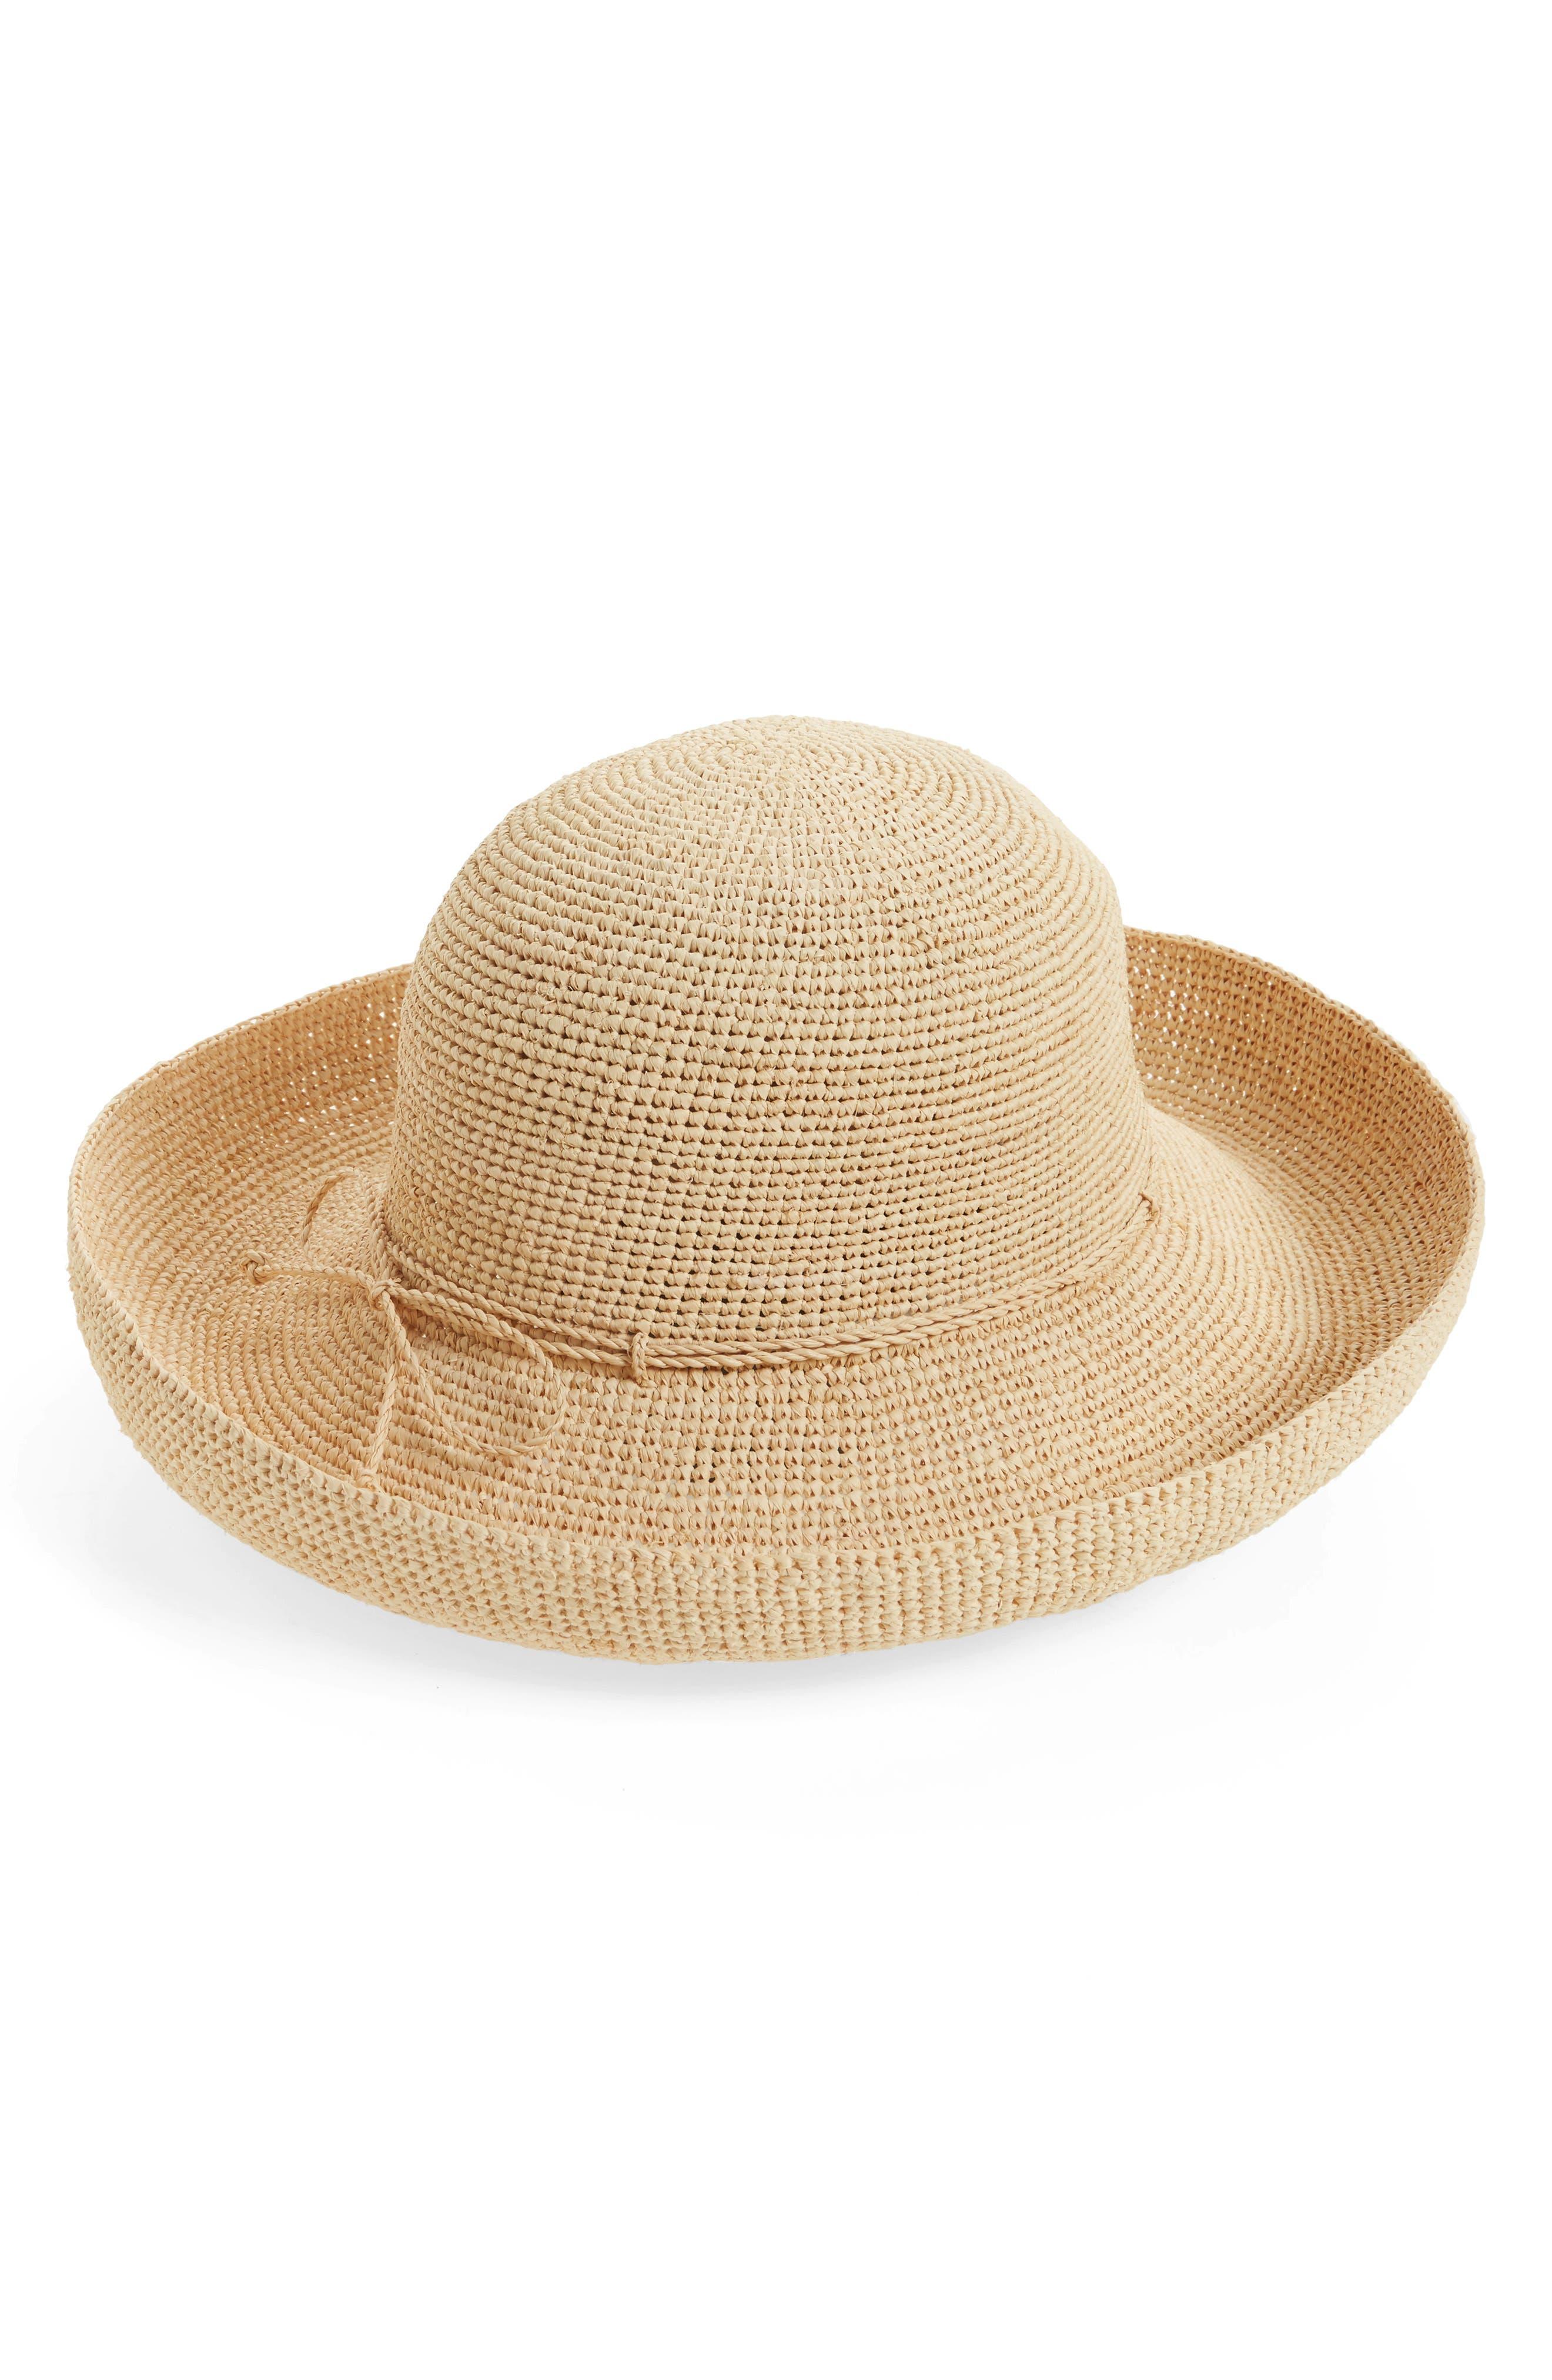 Main Image - Helen Kaminski 'Provence 12' Packable Raffia Hat